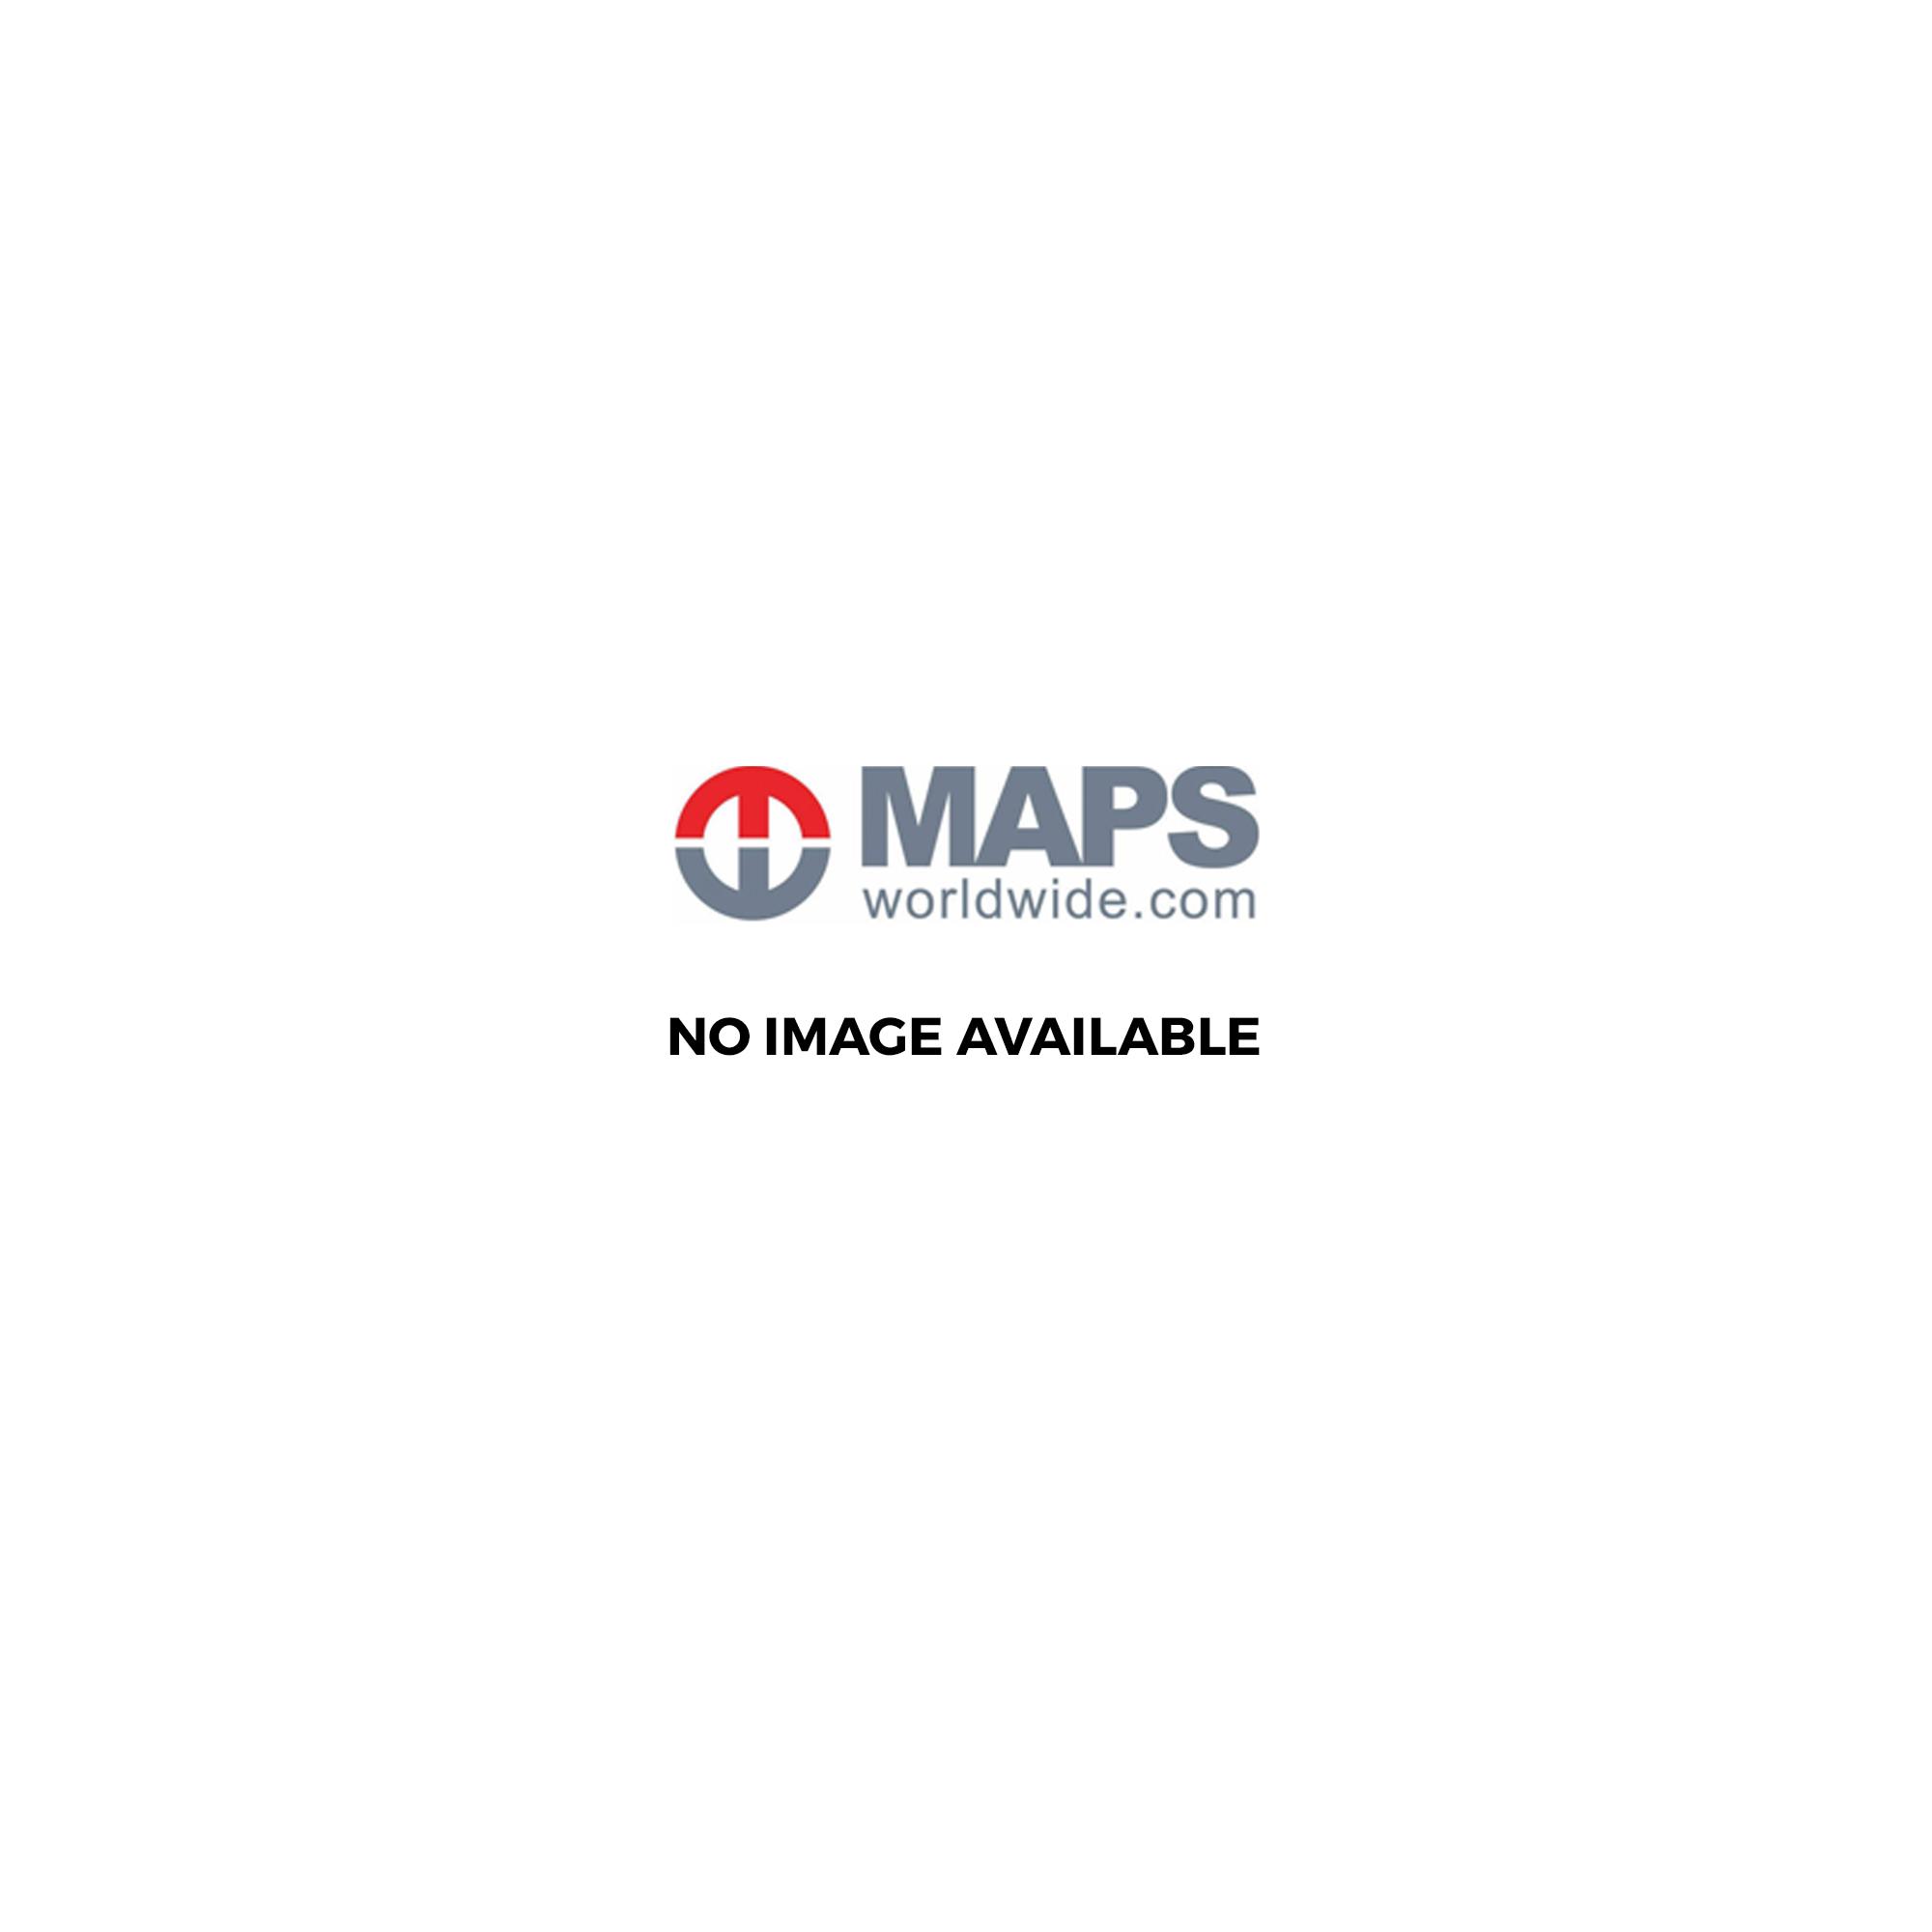 nordeca kart Rakkestad Tourist Map: 2748   Europe from Maps Worldwide UK nordeca kart